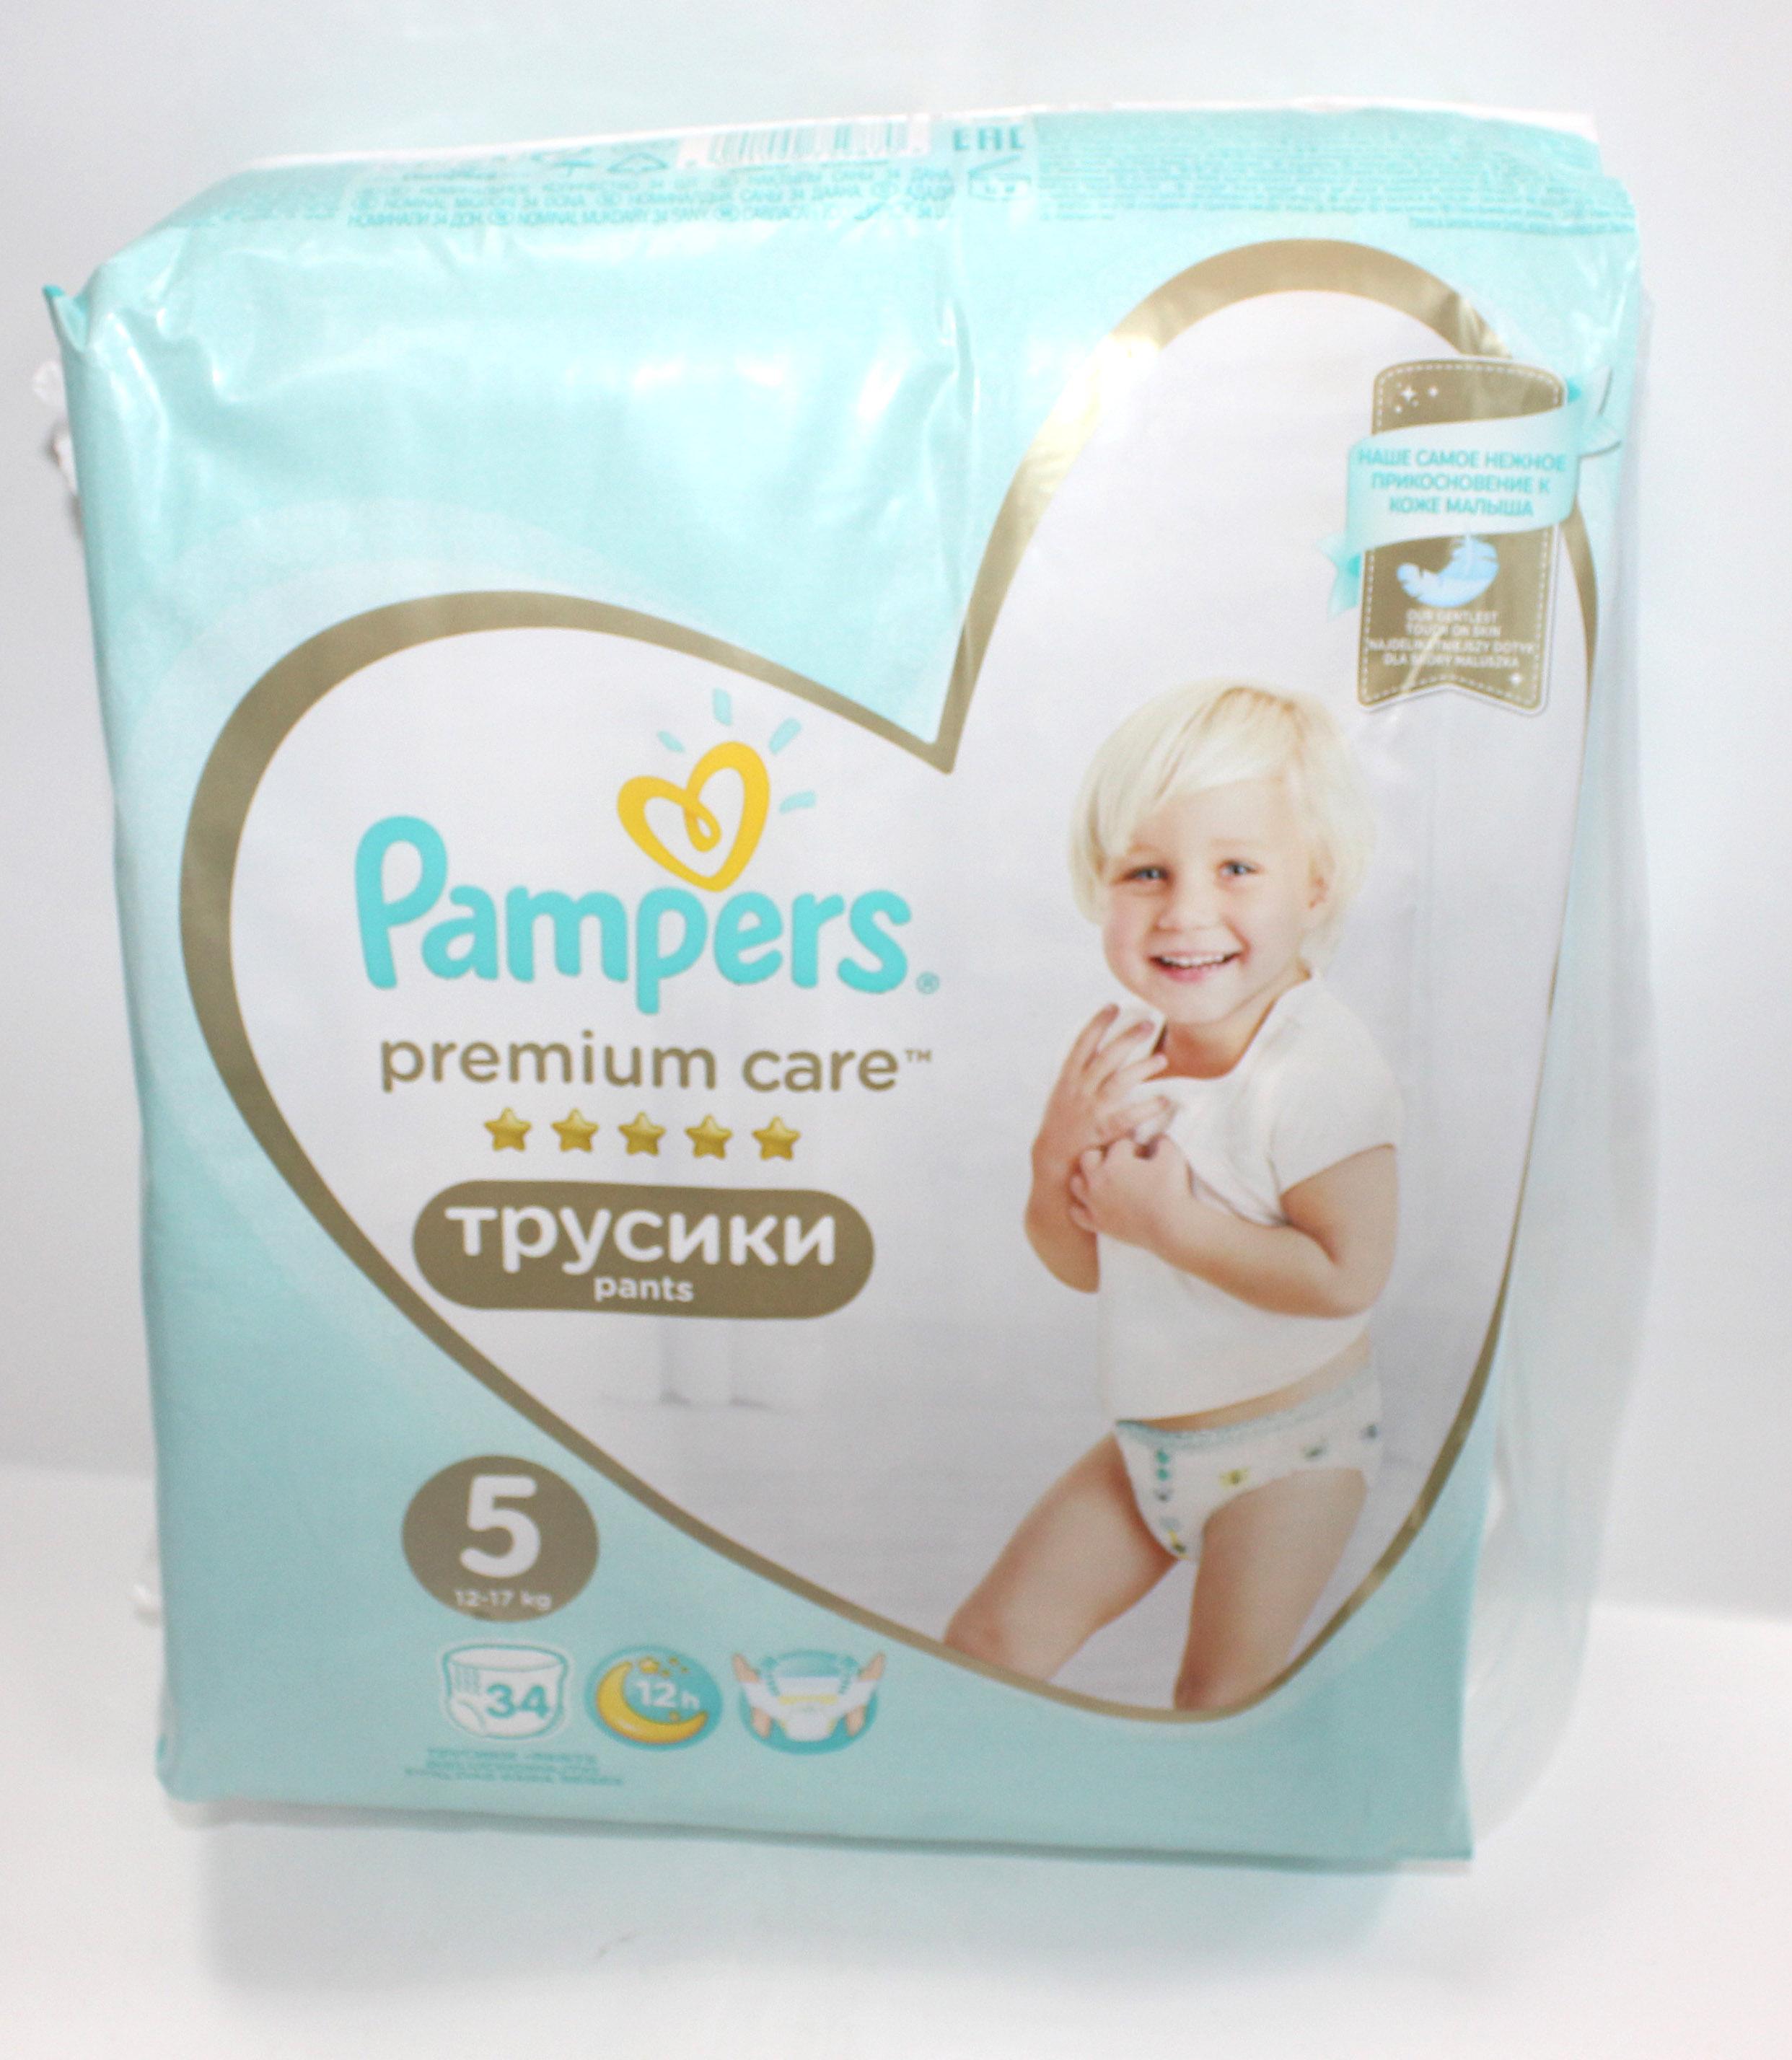 PAMPERS - ТРУСИКИ PAMPERS PREMIUM CARE PANTS S5 34шт 12-18кг 8001090759870